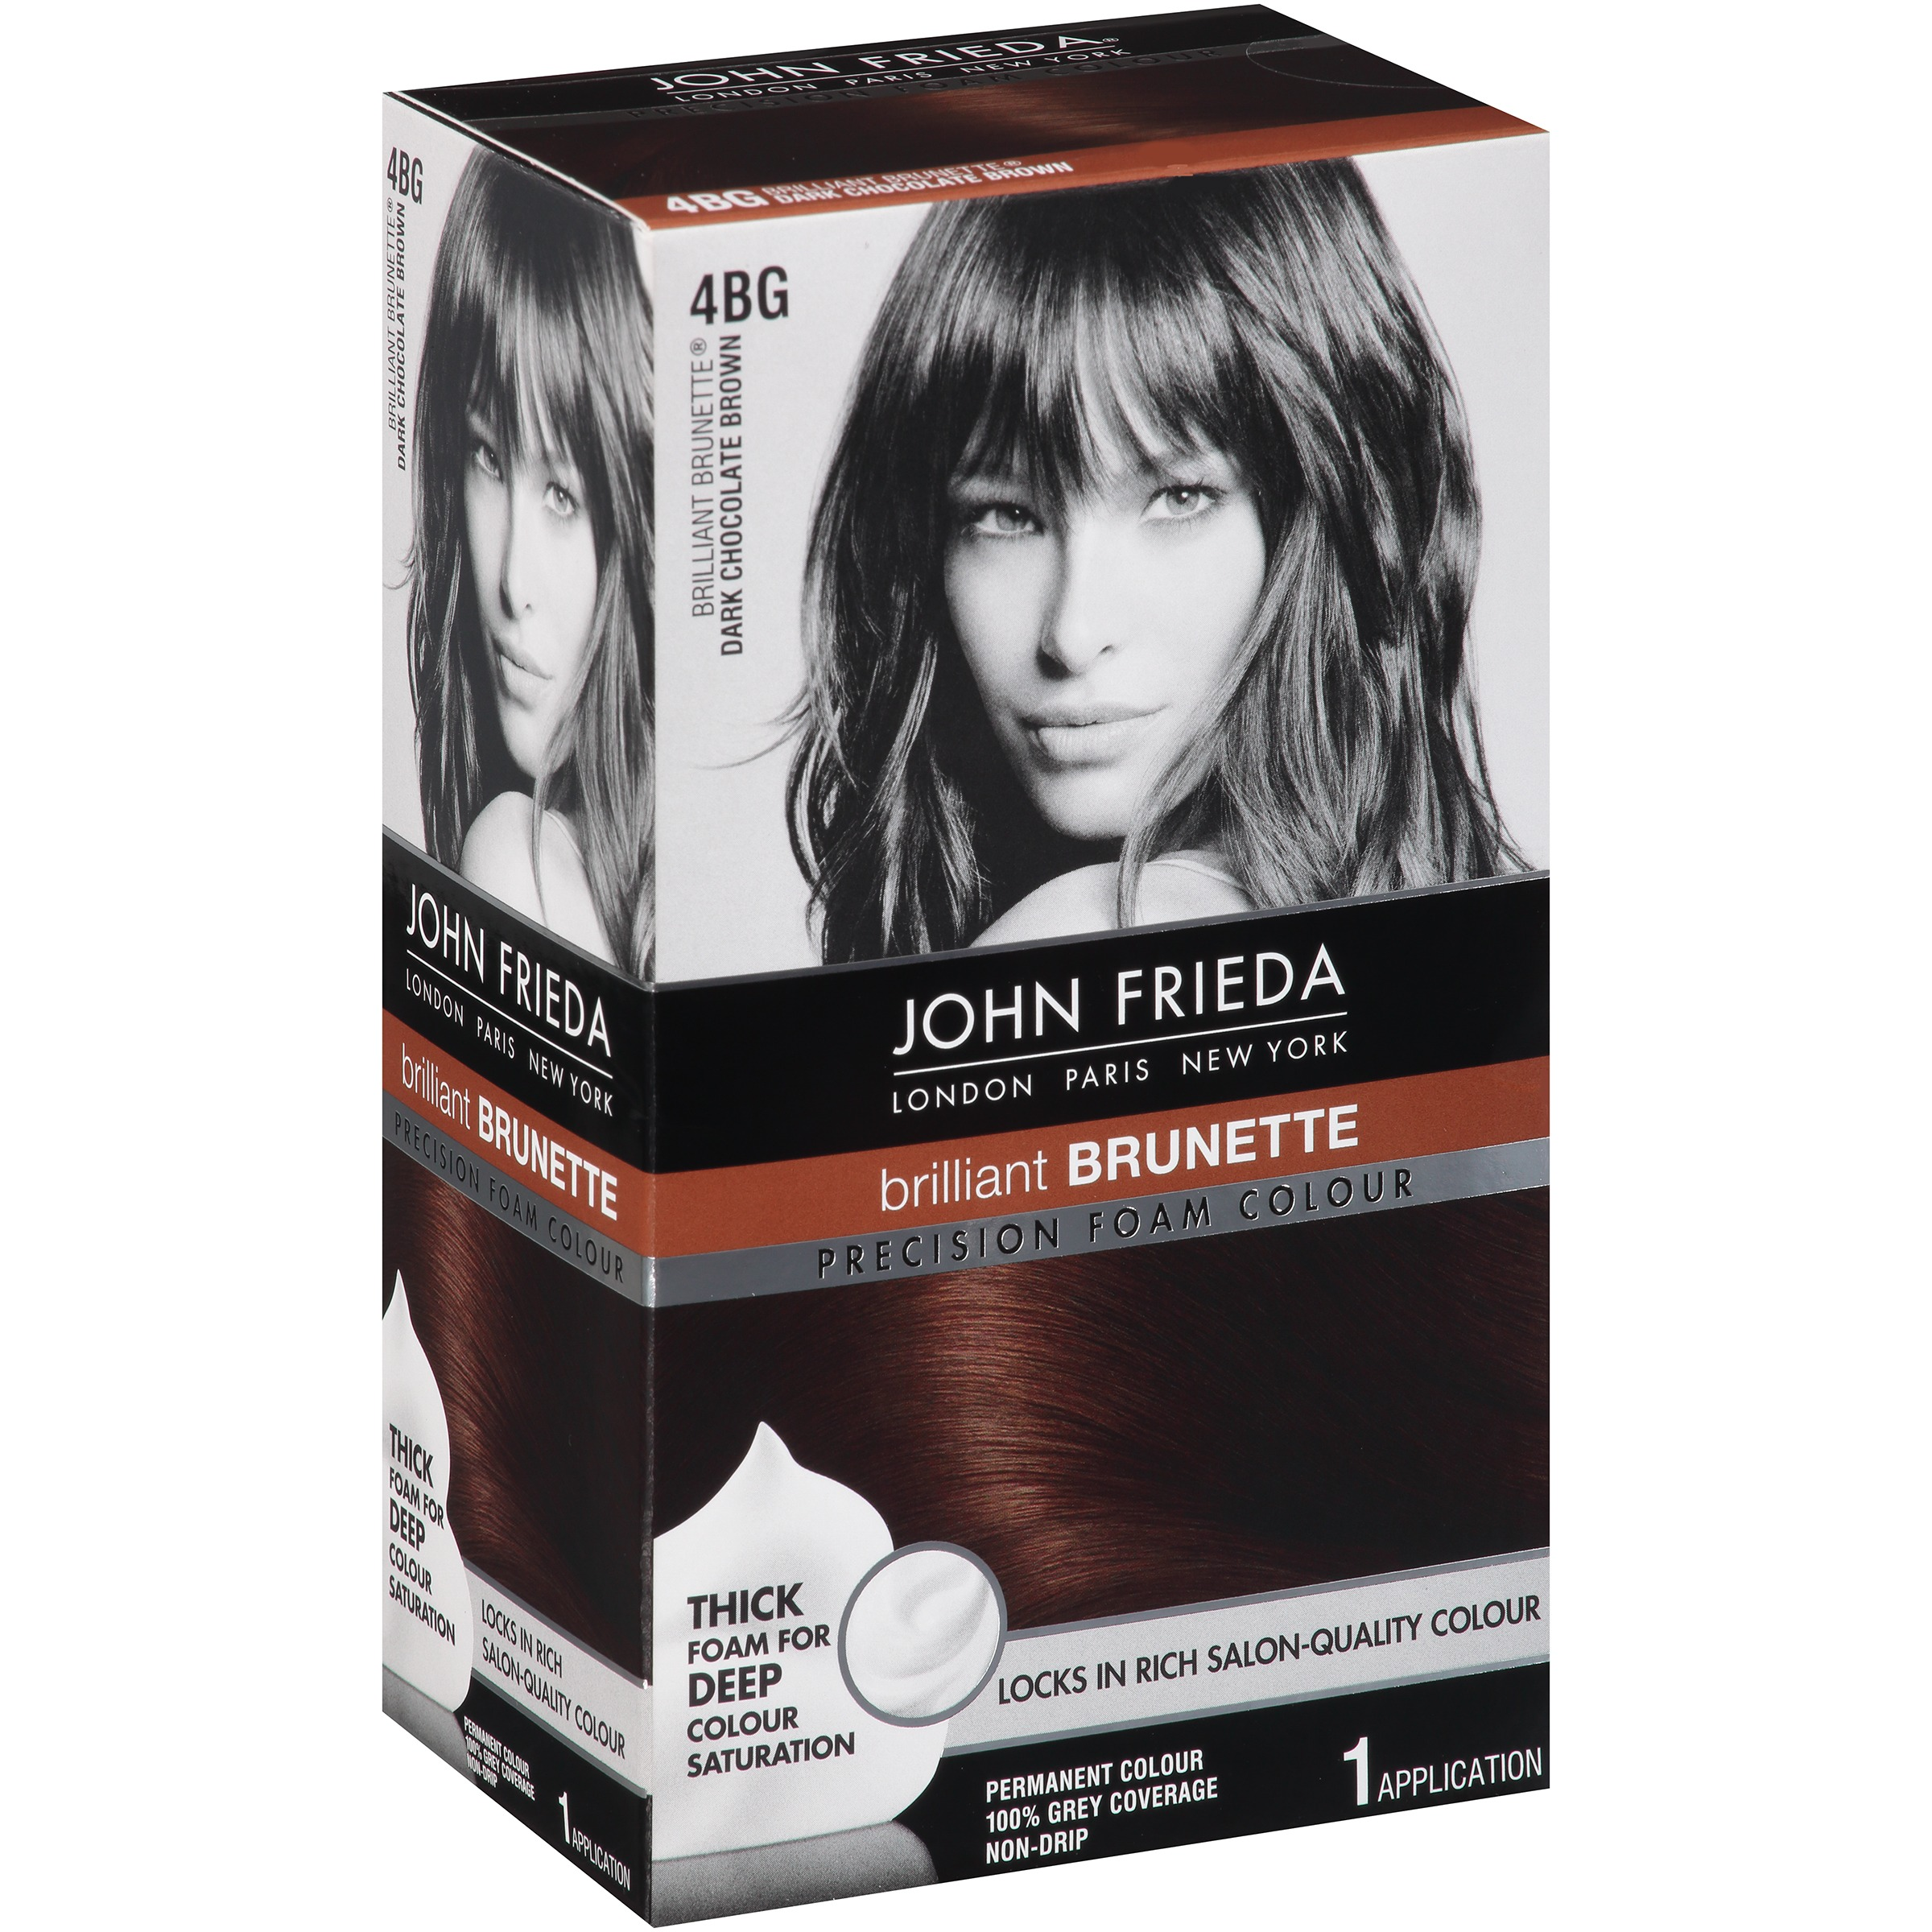 John Frieda Brilliant Brunette 4BG Dark Chocolate Brown Permanent Colour, 1 application